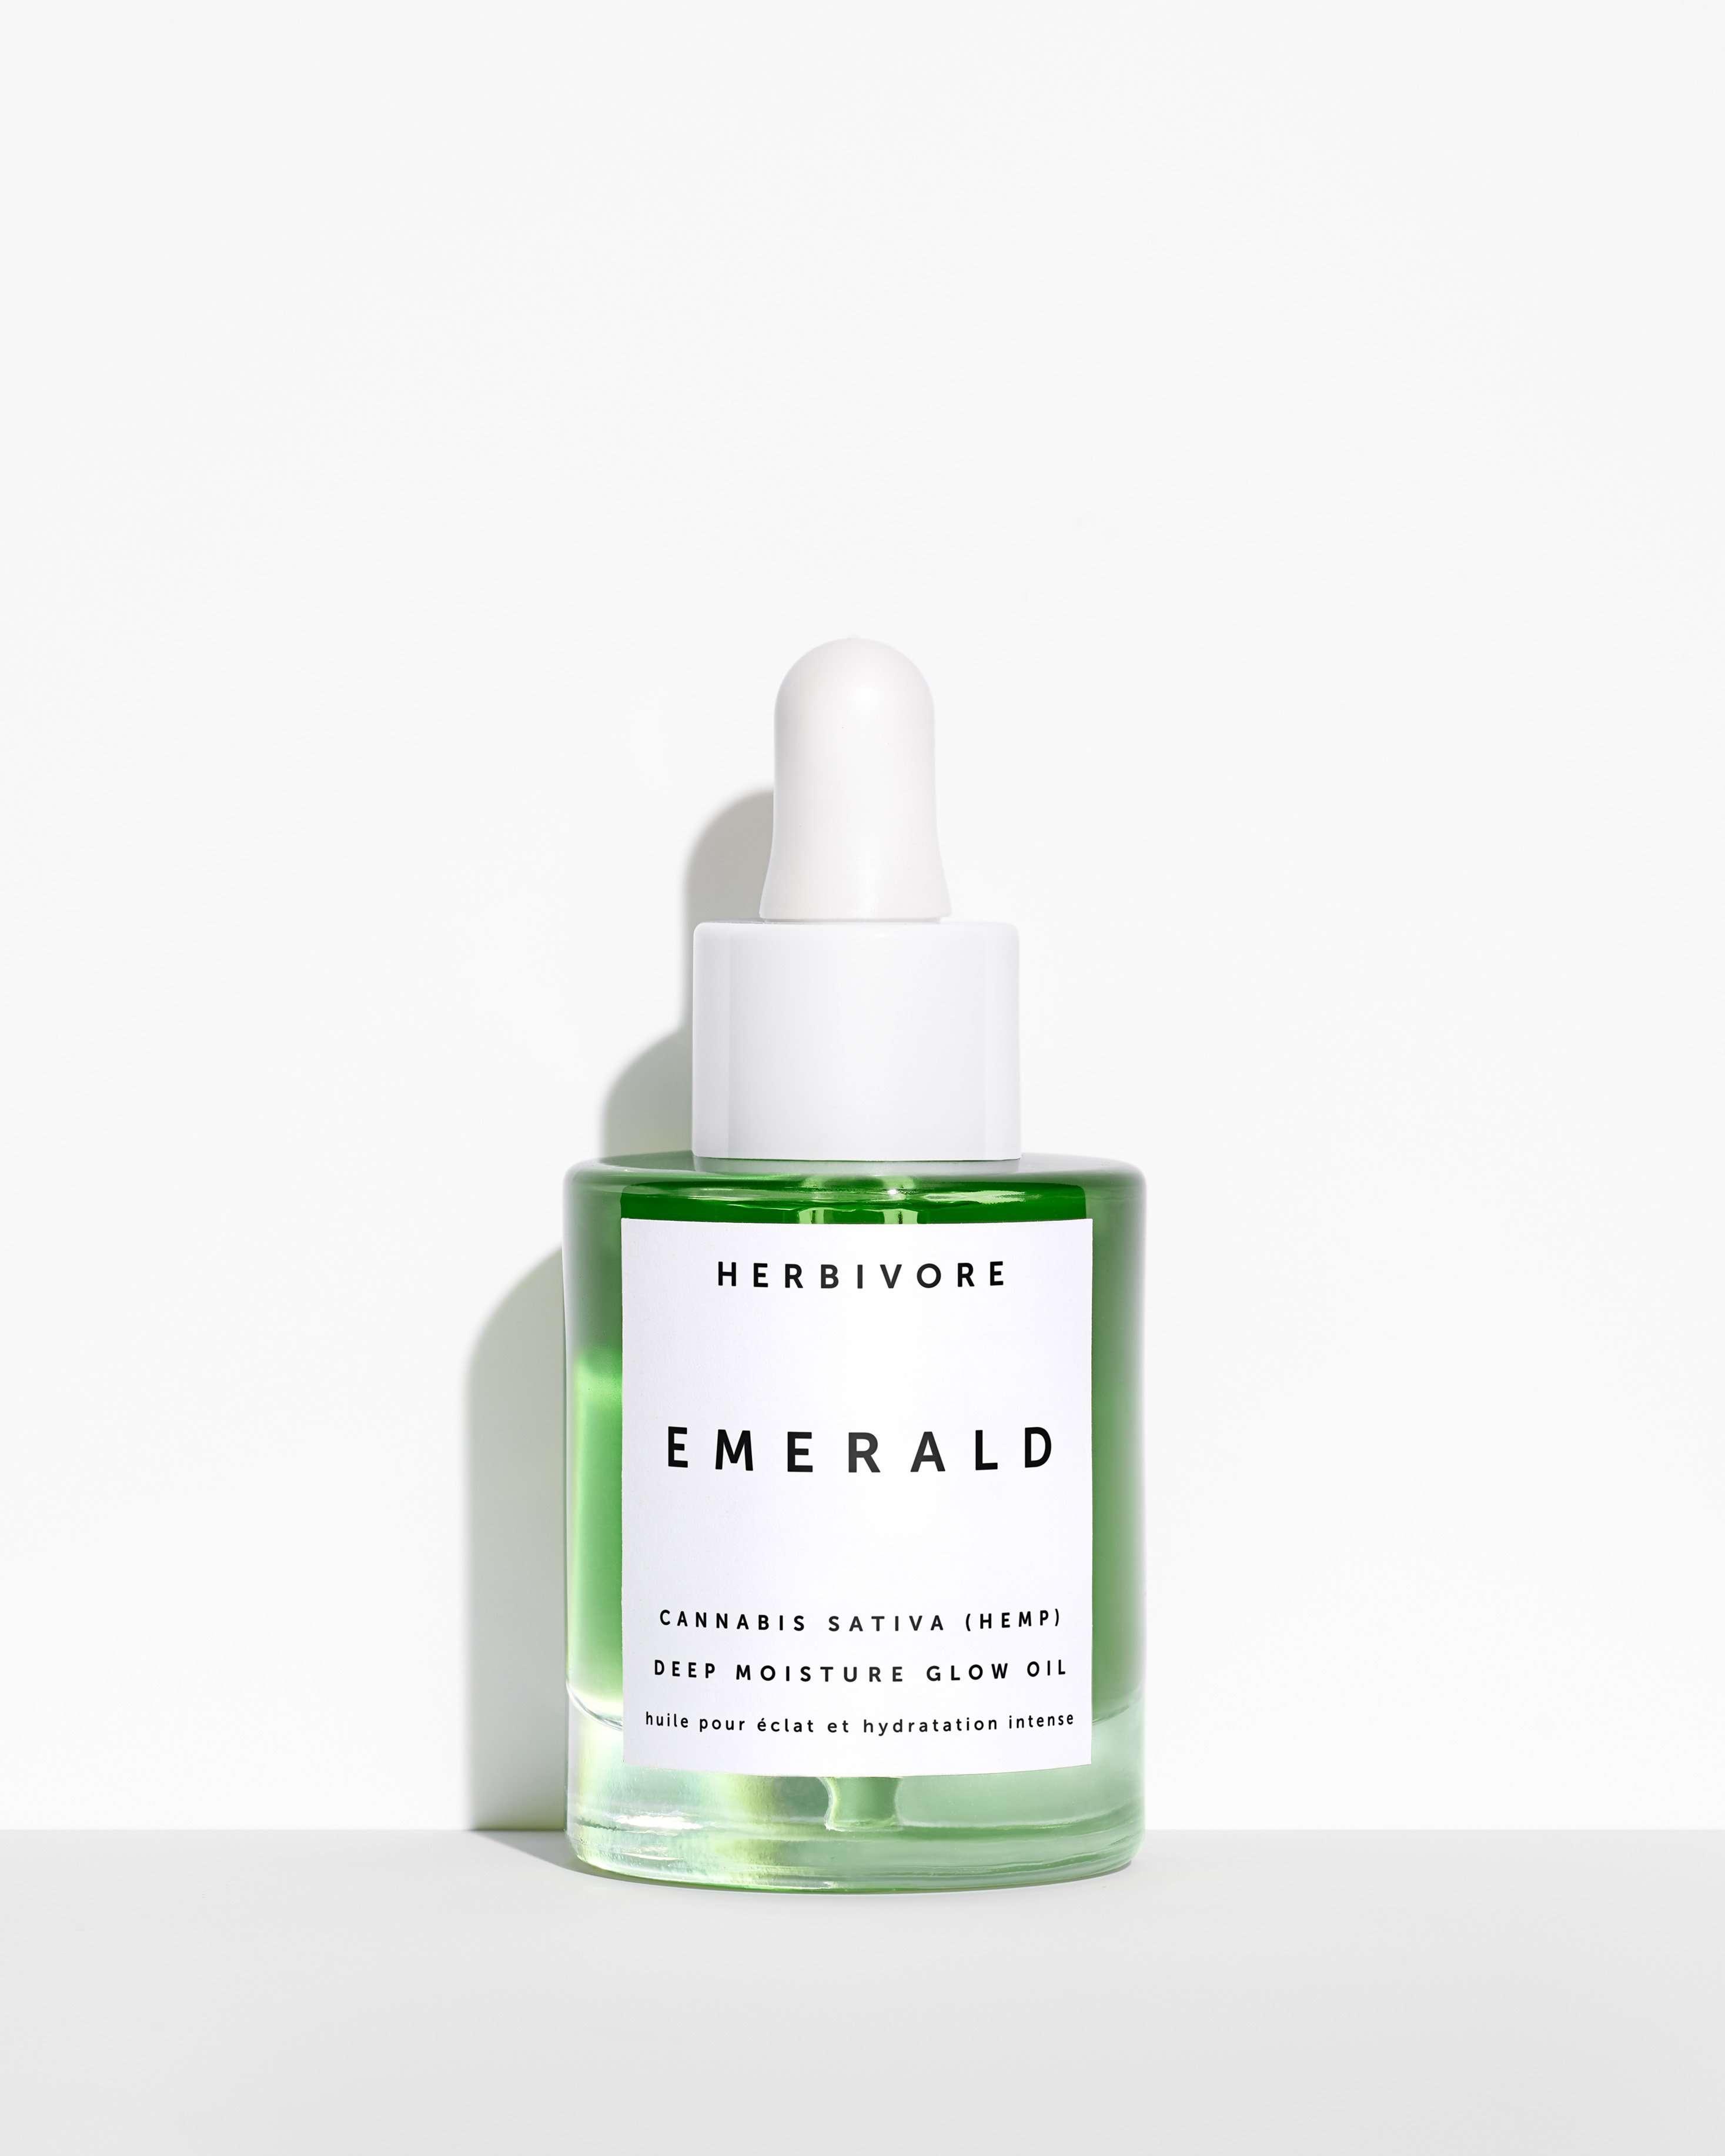 Herbivore Cannabis Sativa Deep Moisture Glow Oil